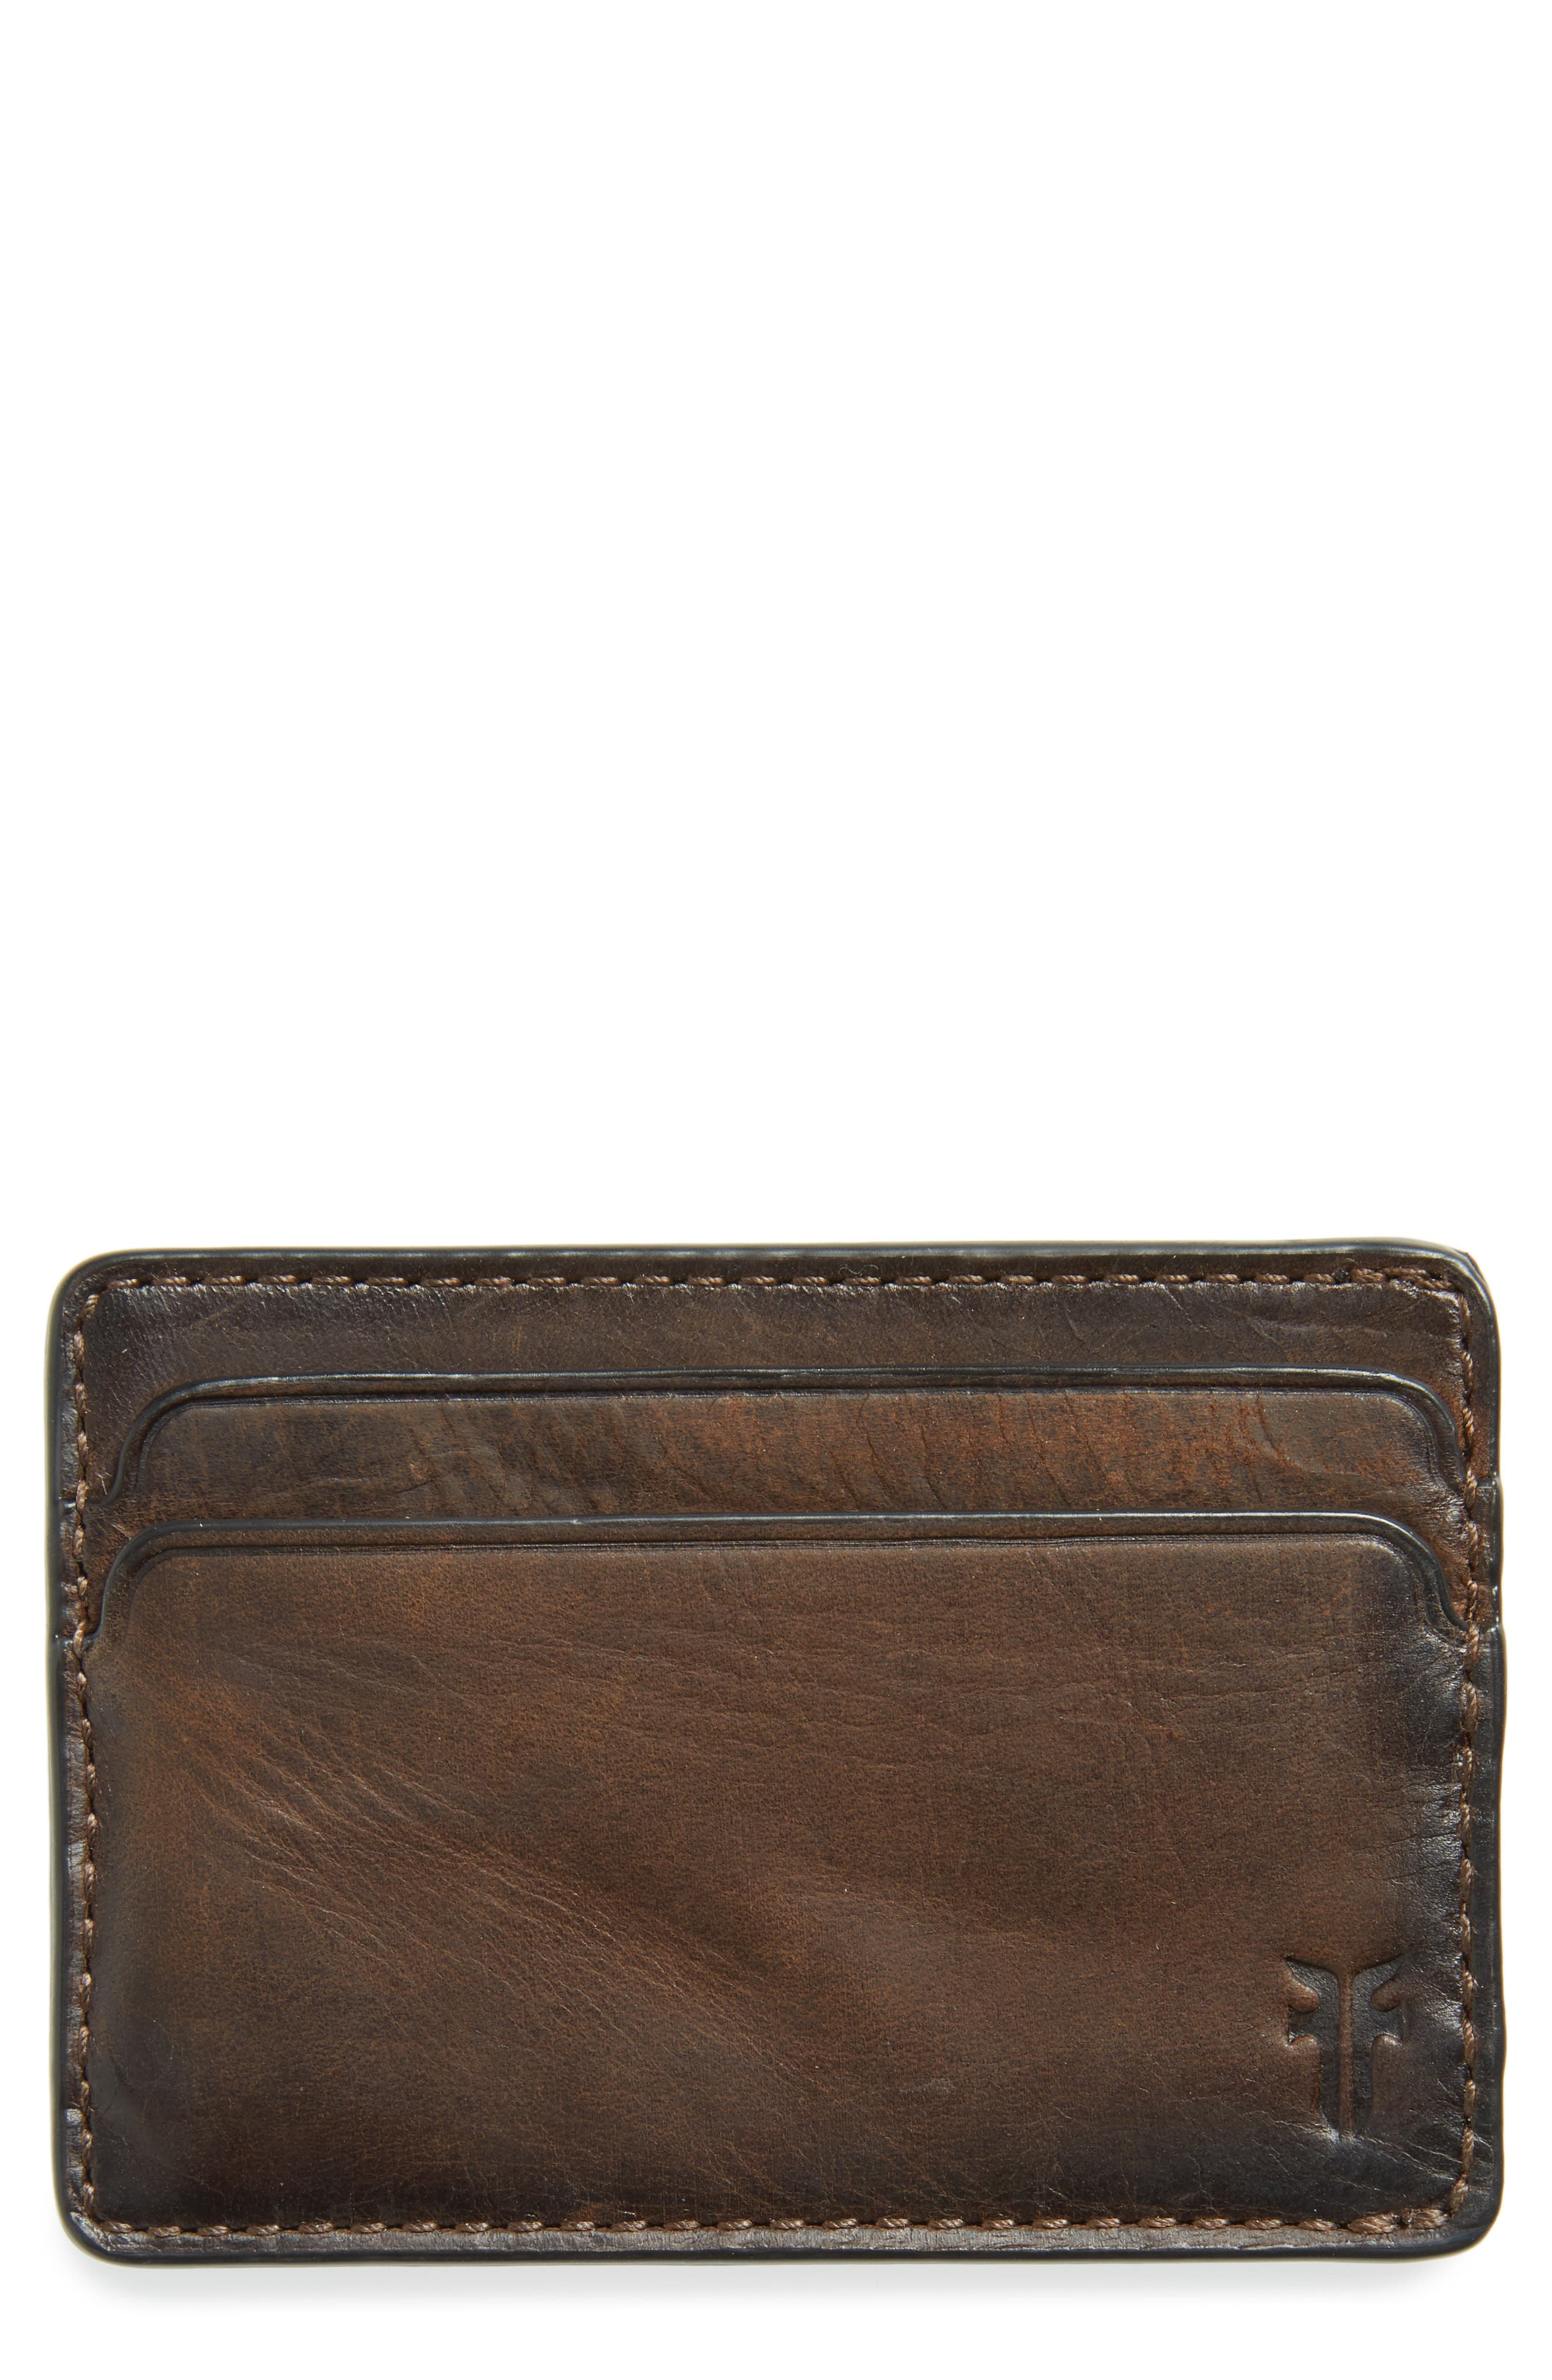 Oliver Leather Card Case,                         Main,                         color, Dark Brown